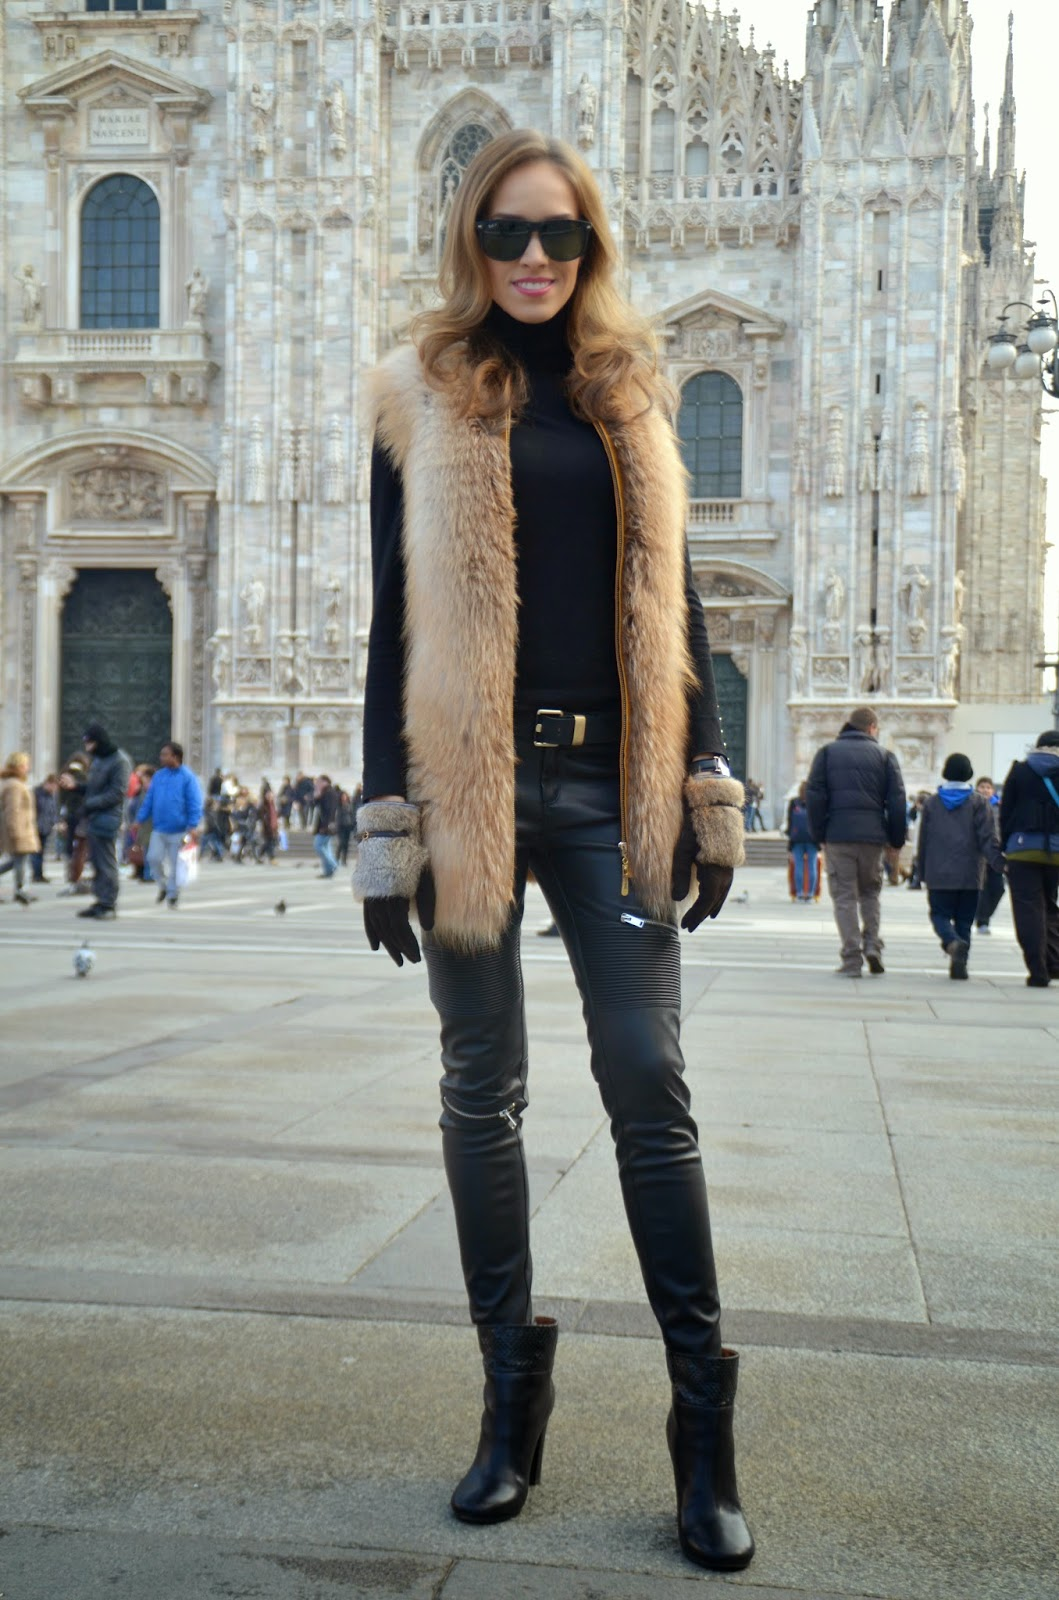 piazza-del-duomo-outfit-fur-vest-leather-pants-black kristjaana mere